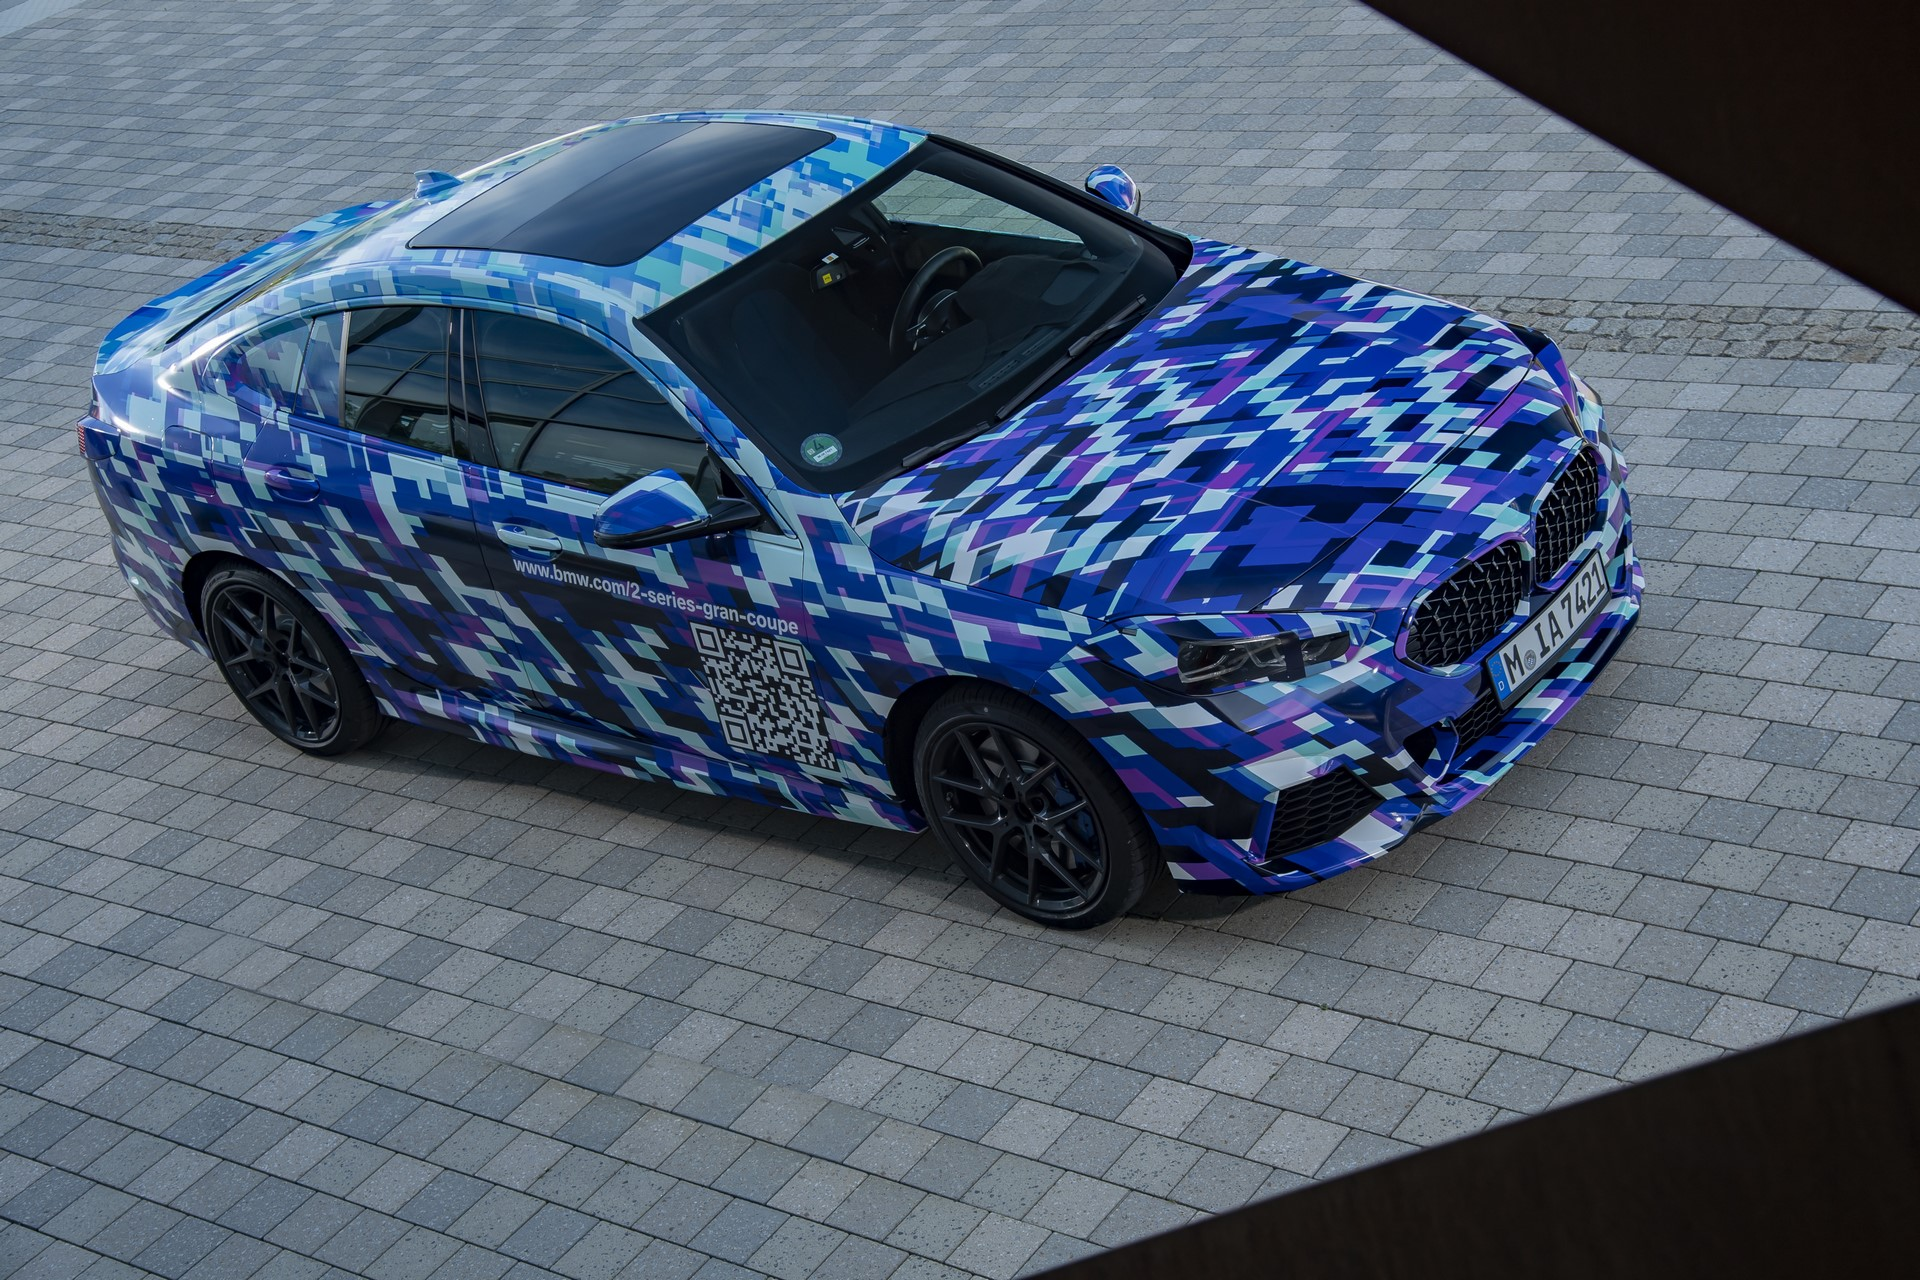 BMW-2-Series-Gran-Coupe-2020-spy-photos-21